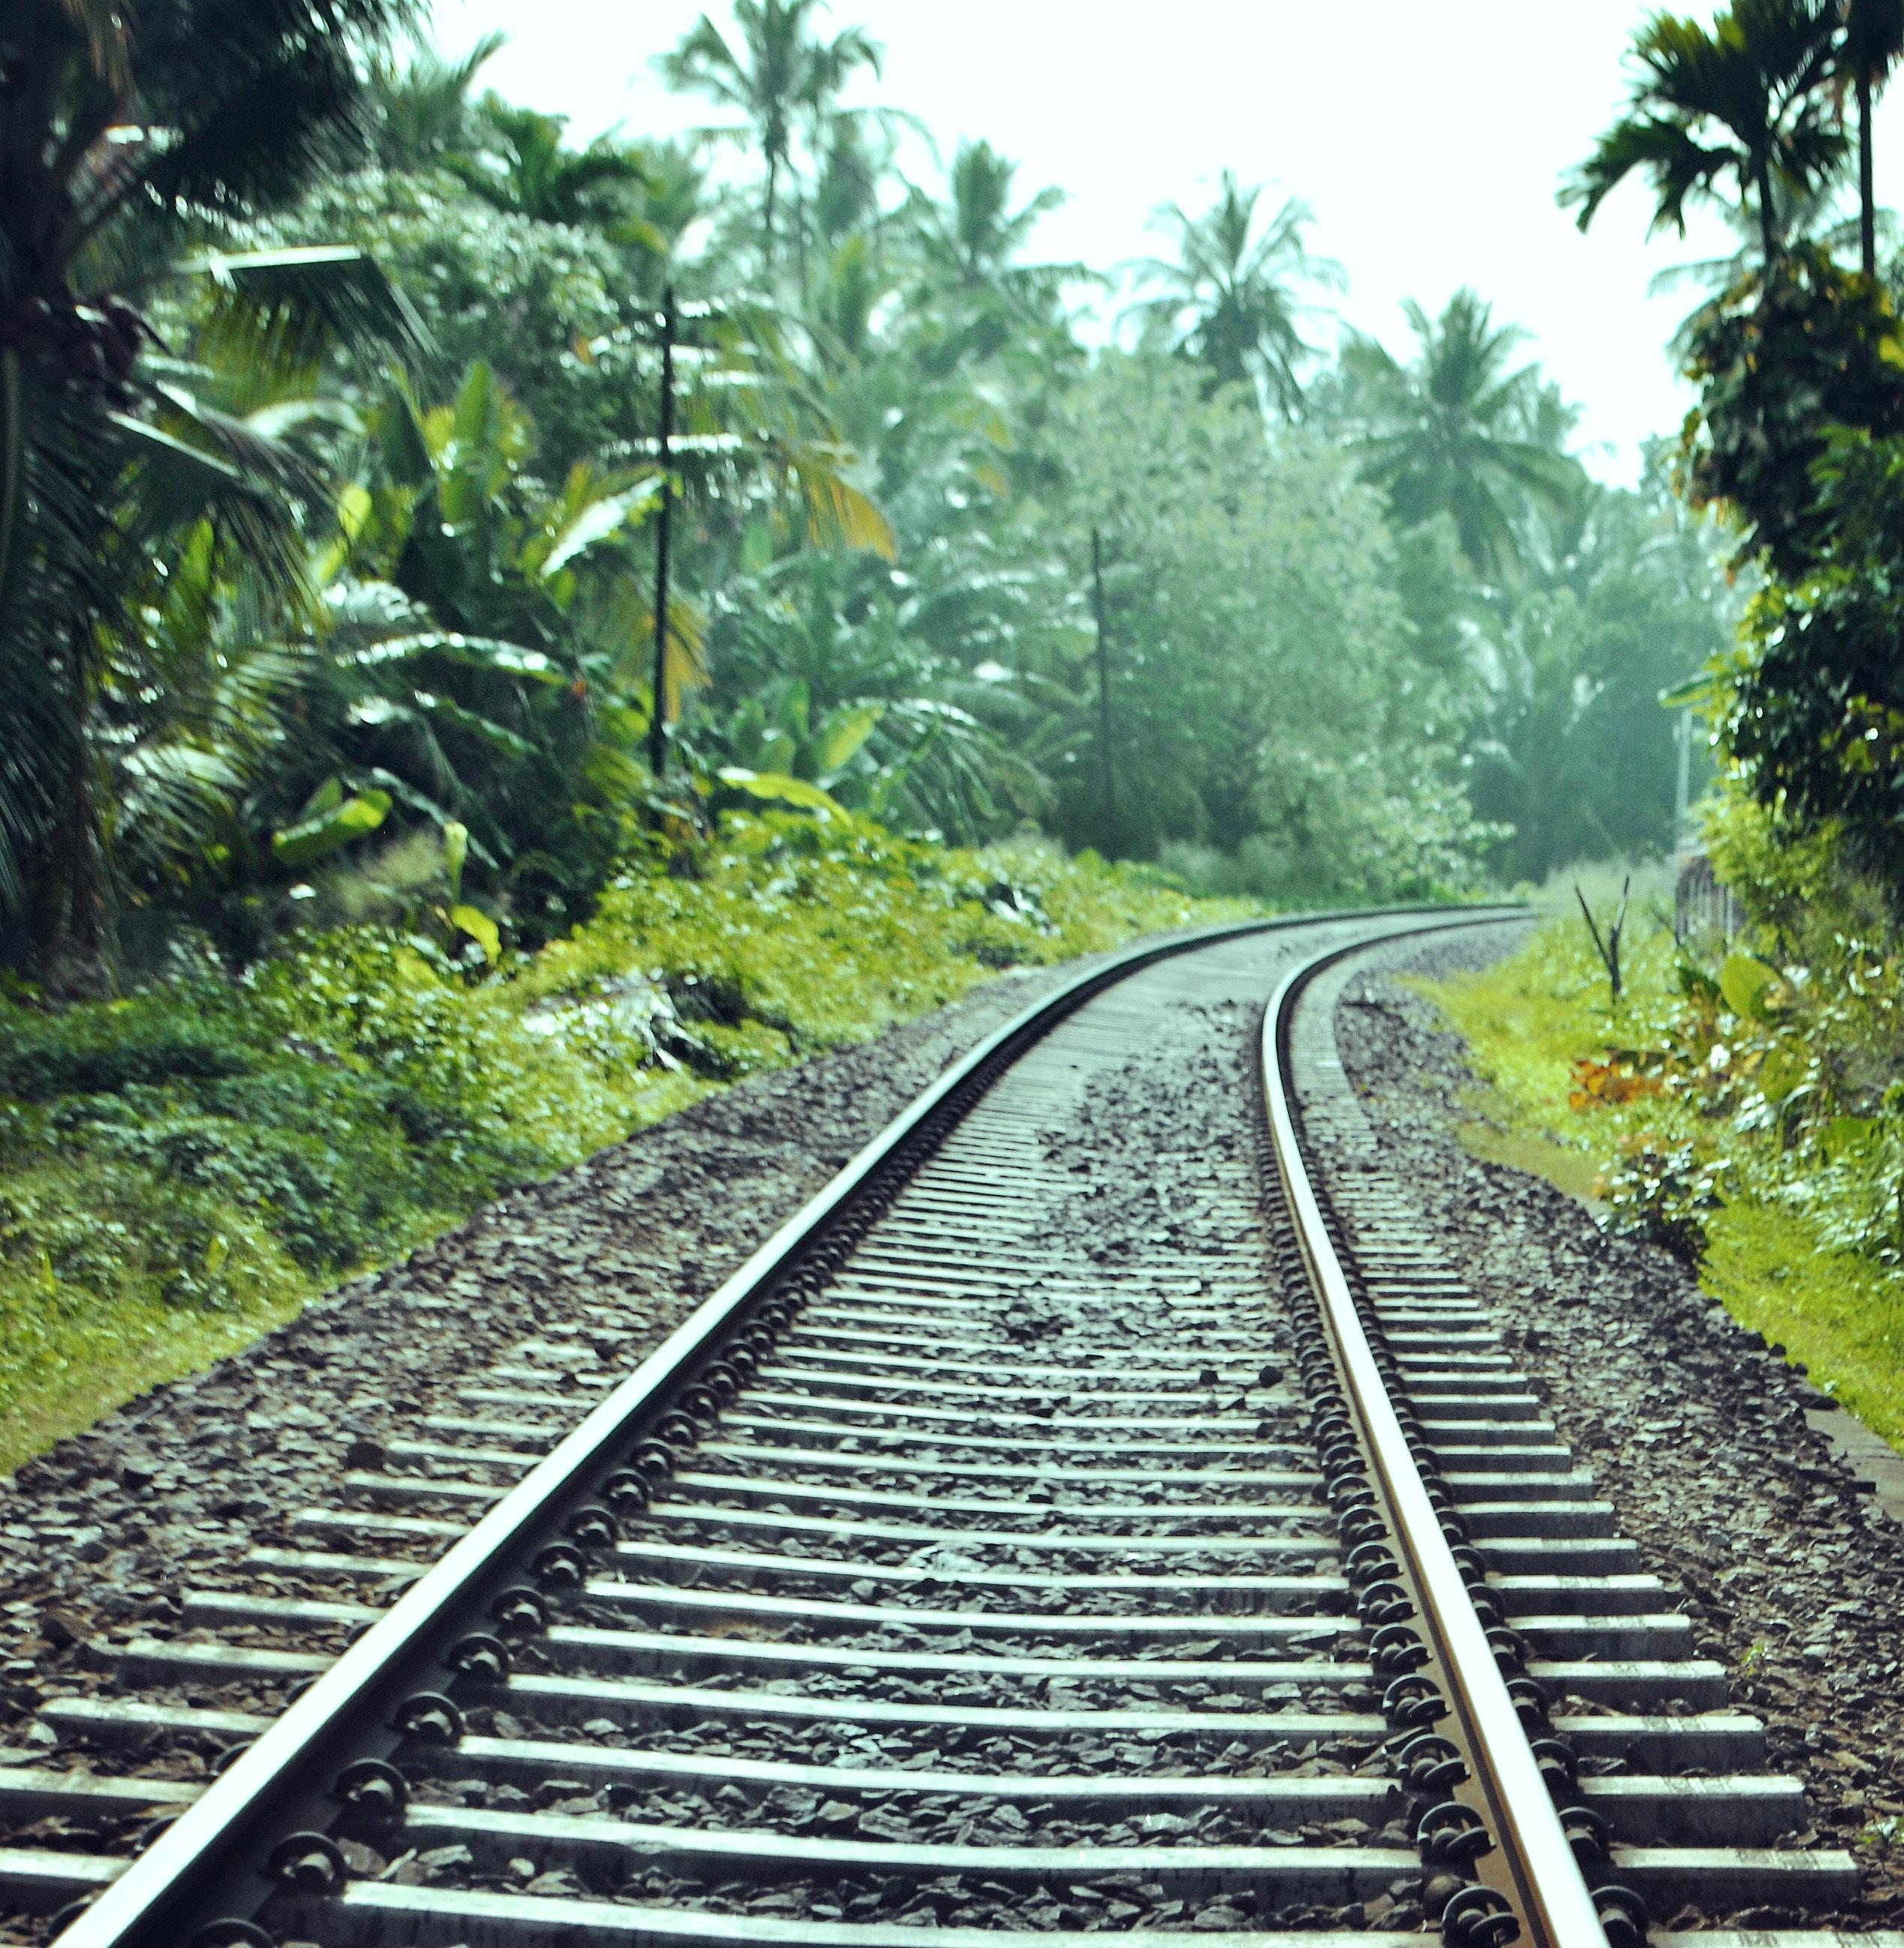 train railway between trees